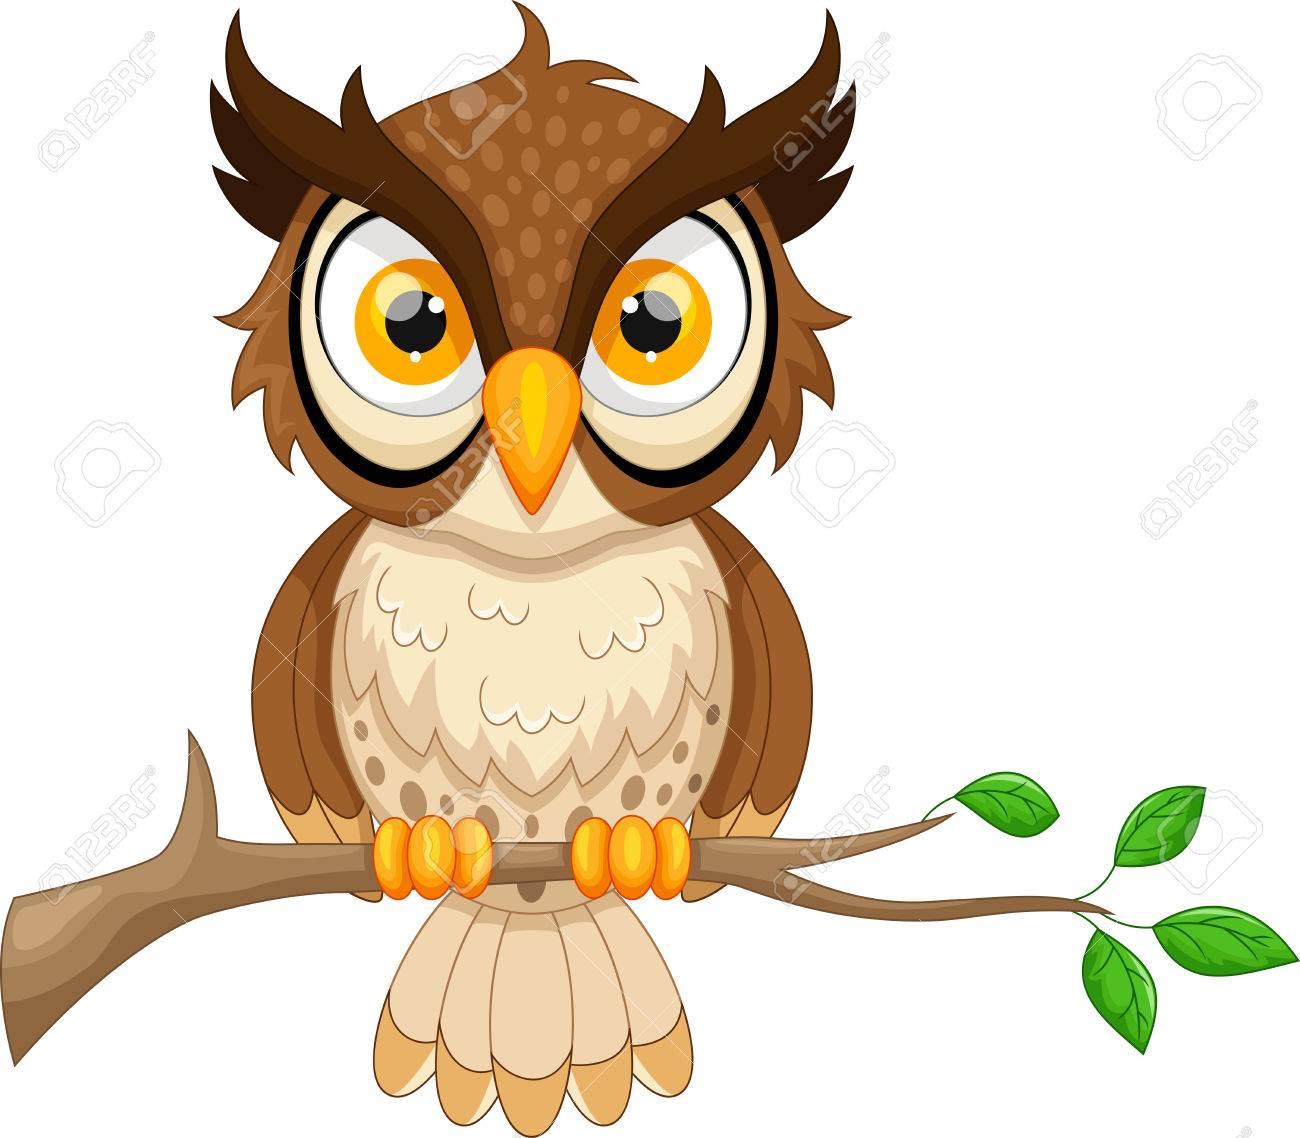 Cartoon owl sitting on tree branch - 52404091